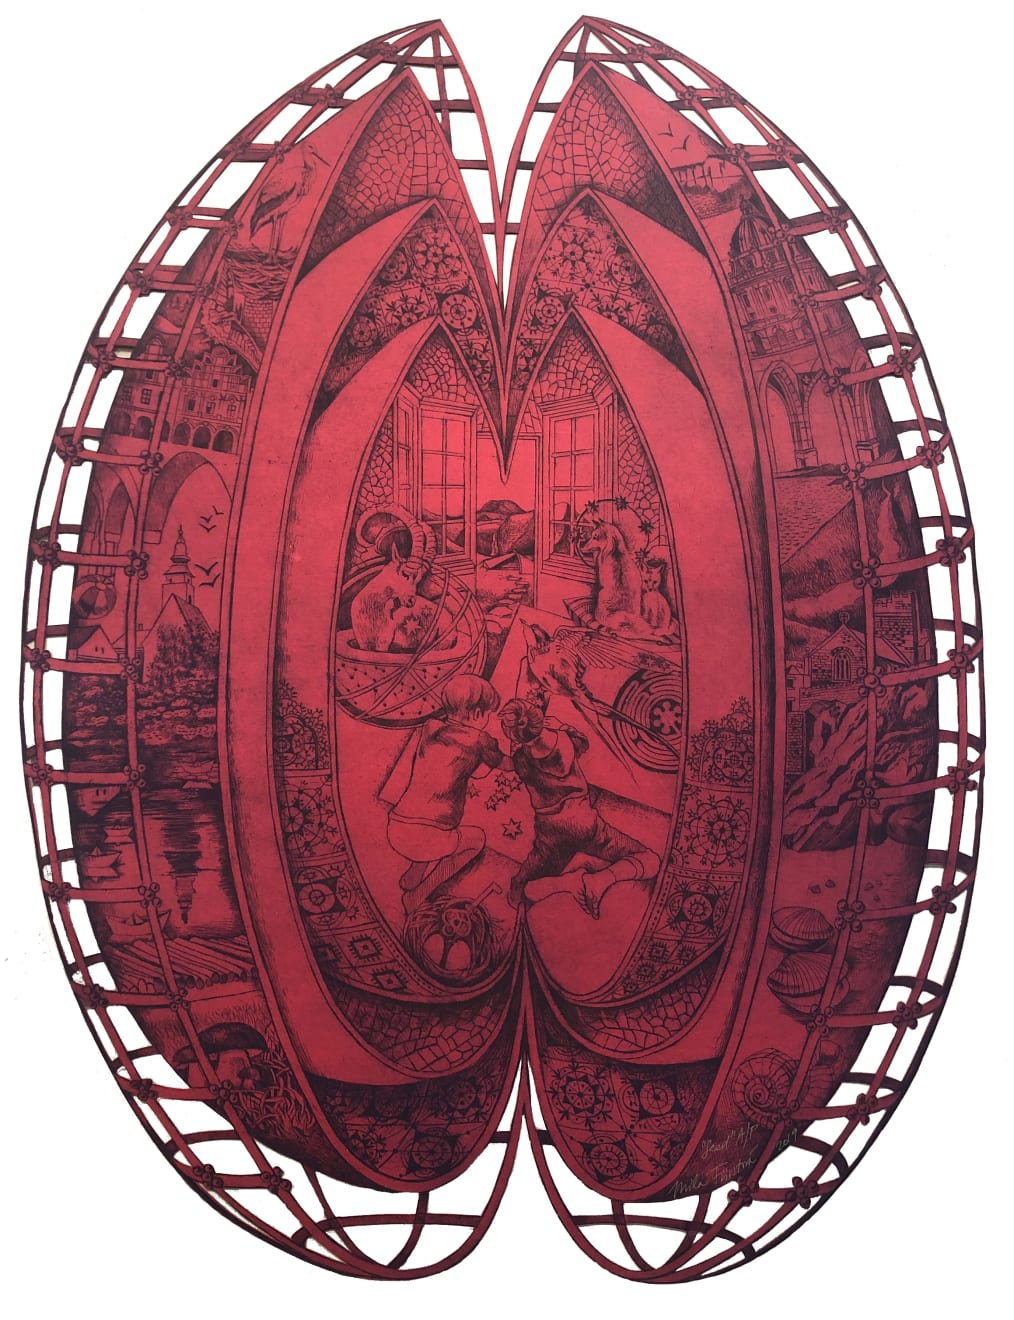 Summer Auction 2020, LOT 59 - Míla Fürstová - 'Seed' (Red), 2019